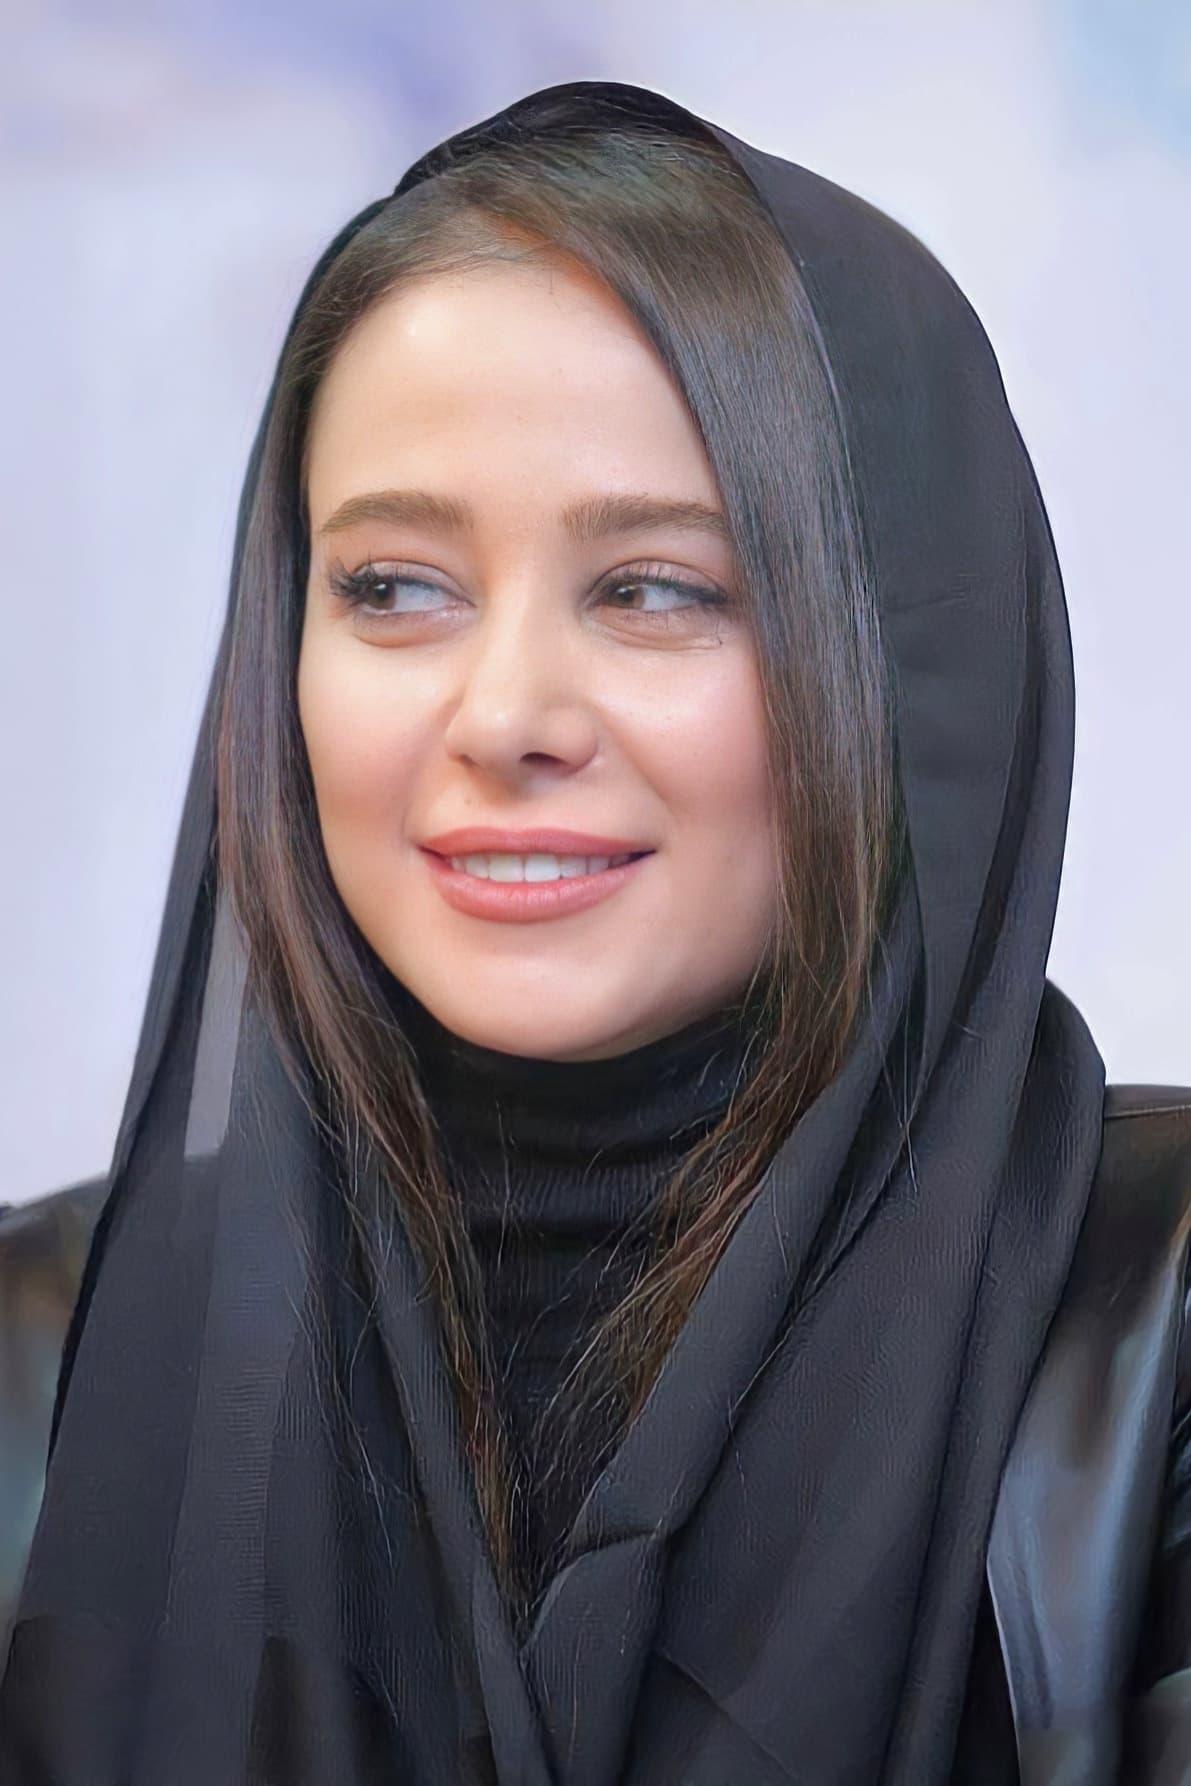 Elnaz Habibi